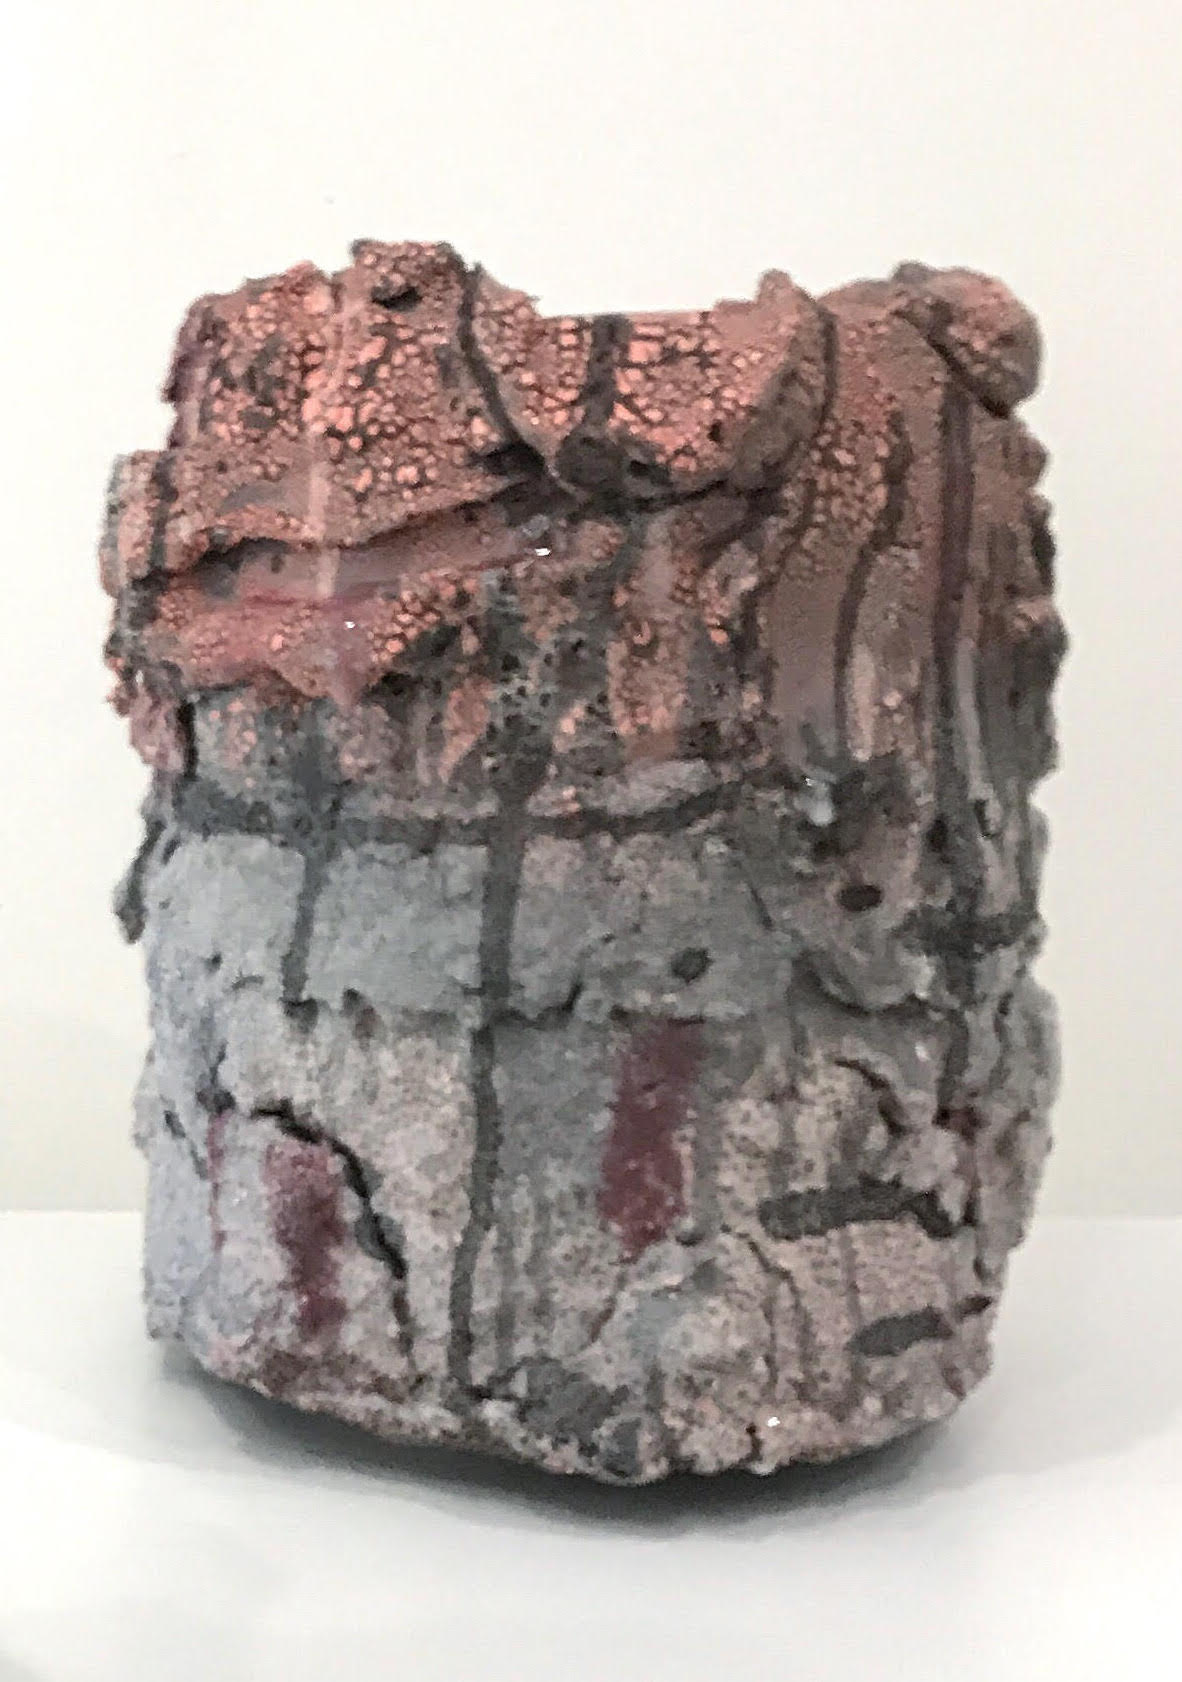 Brian Rochefort  Vessel 235 , 2016 ceramic, glaze 16 x 13 x 13 in.